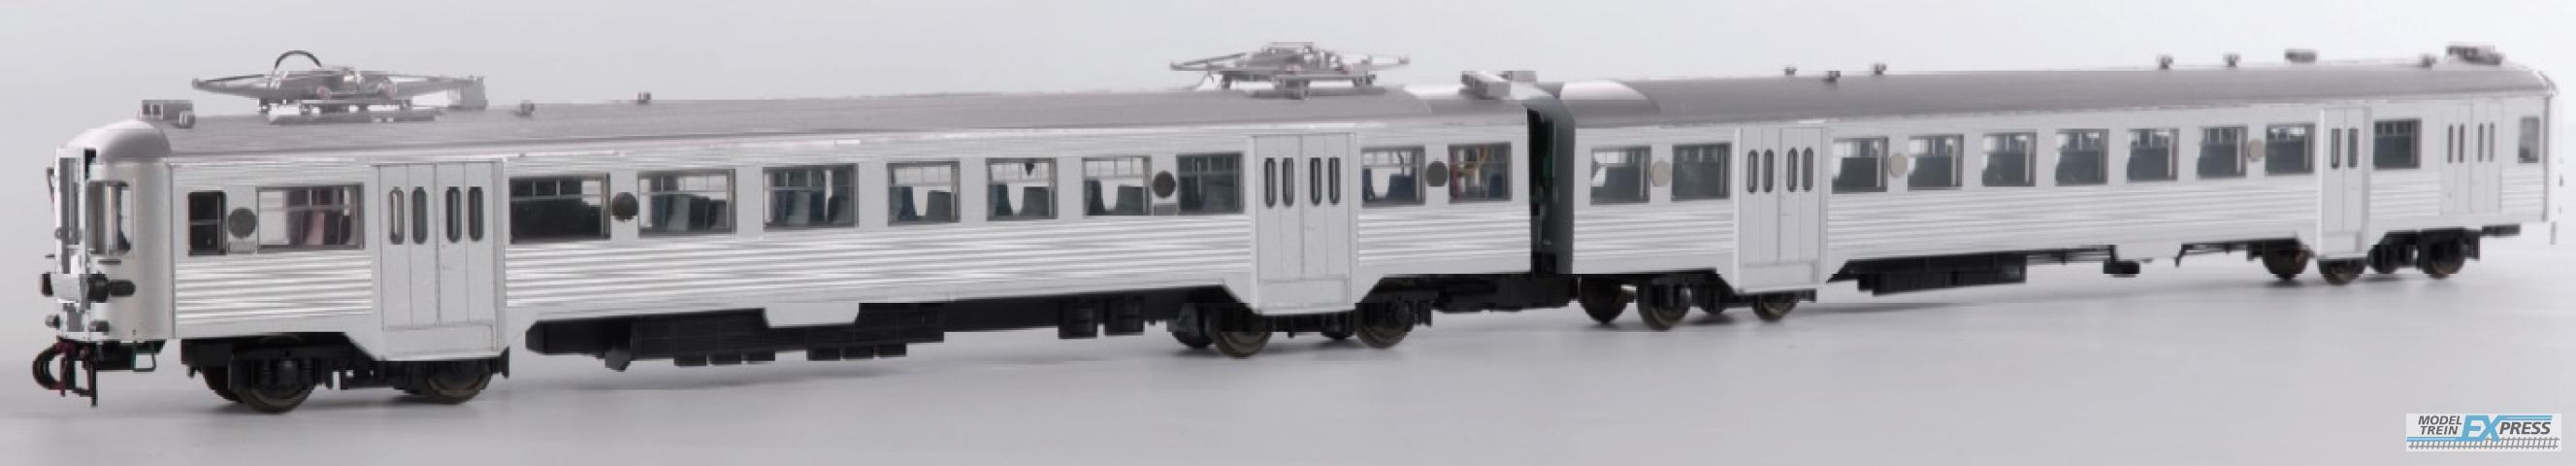 B-Models 7101.05L